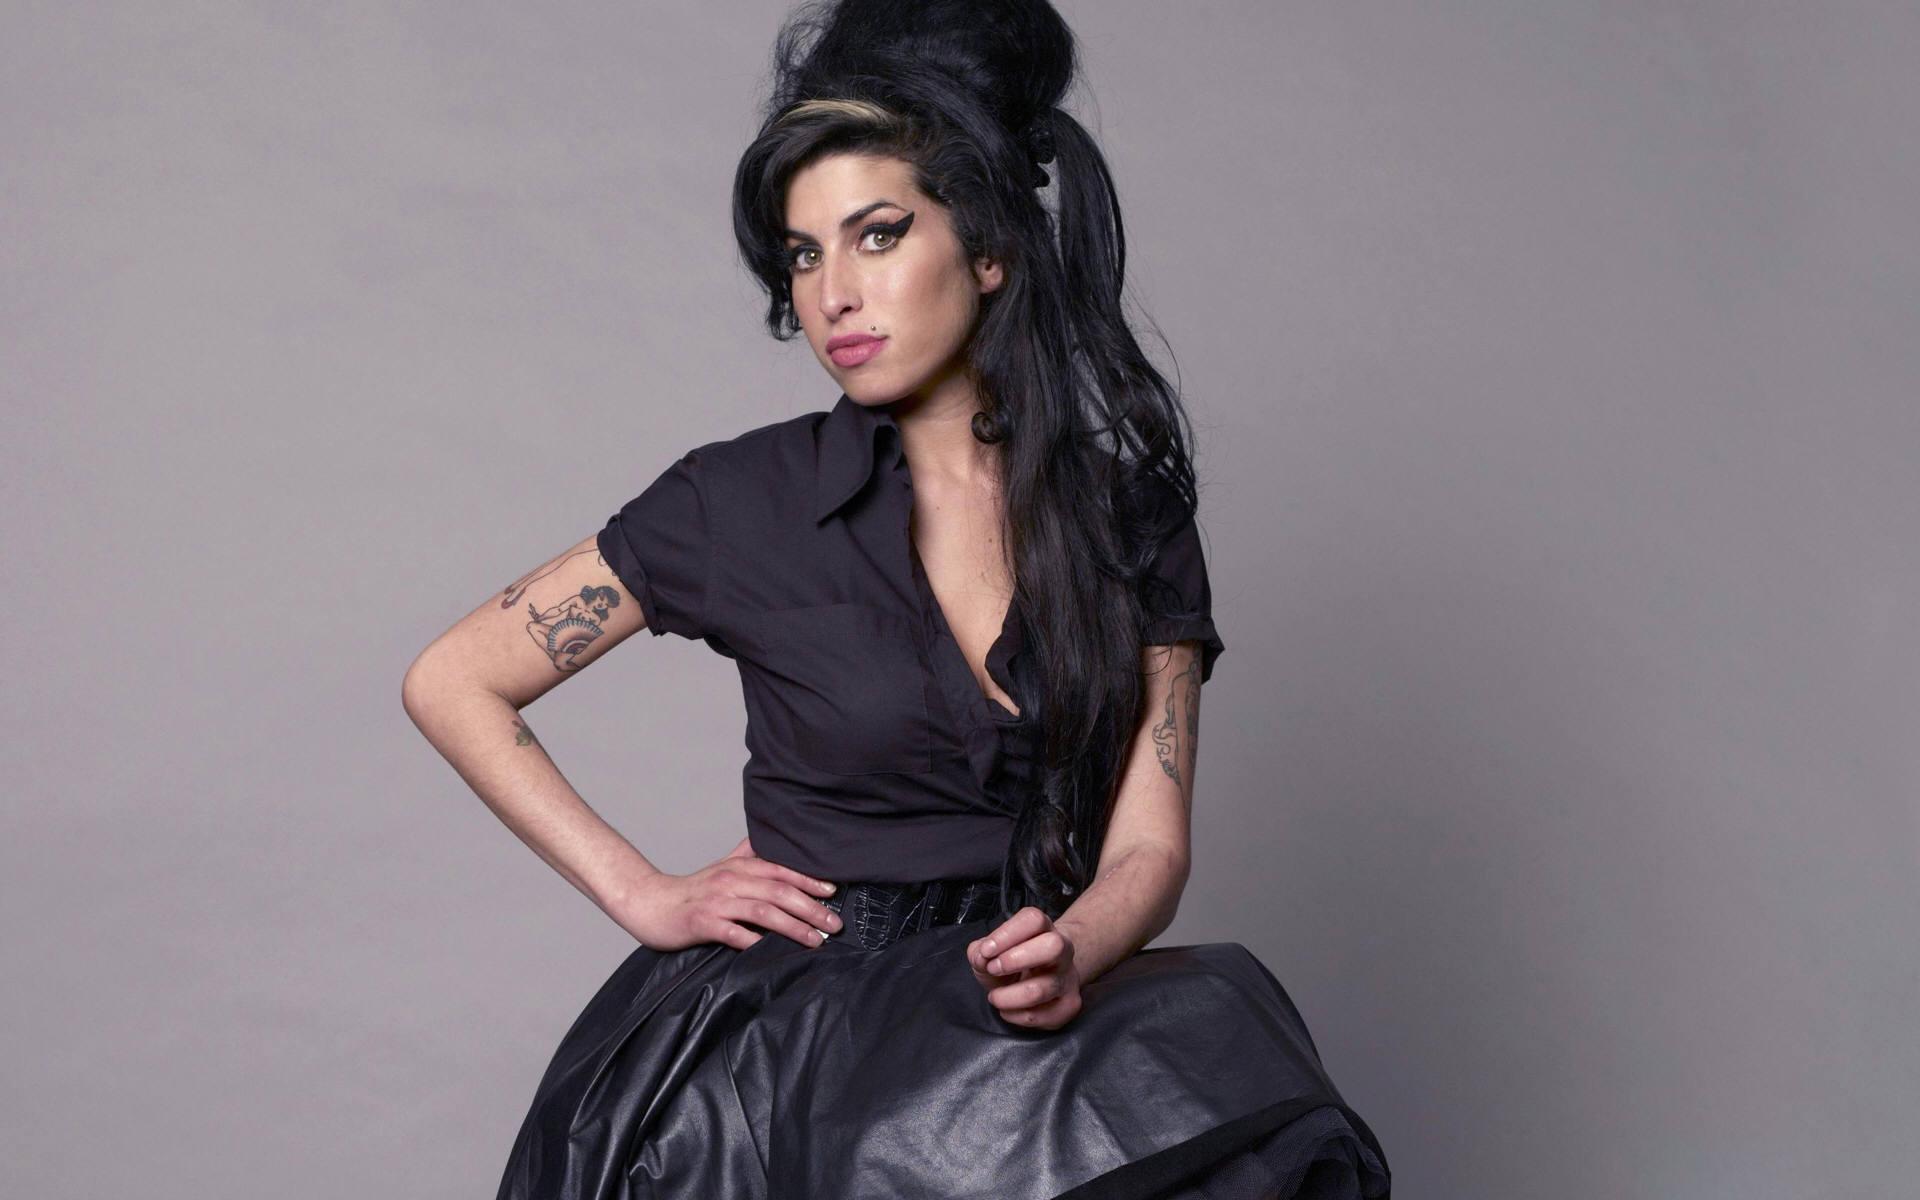 Amy Winehouse Ultra Hd Wallpaper